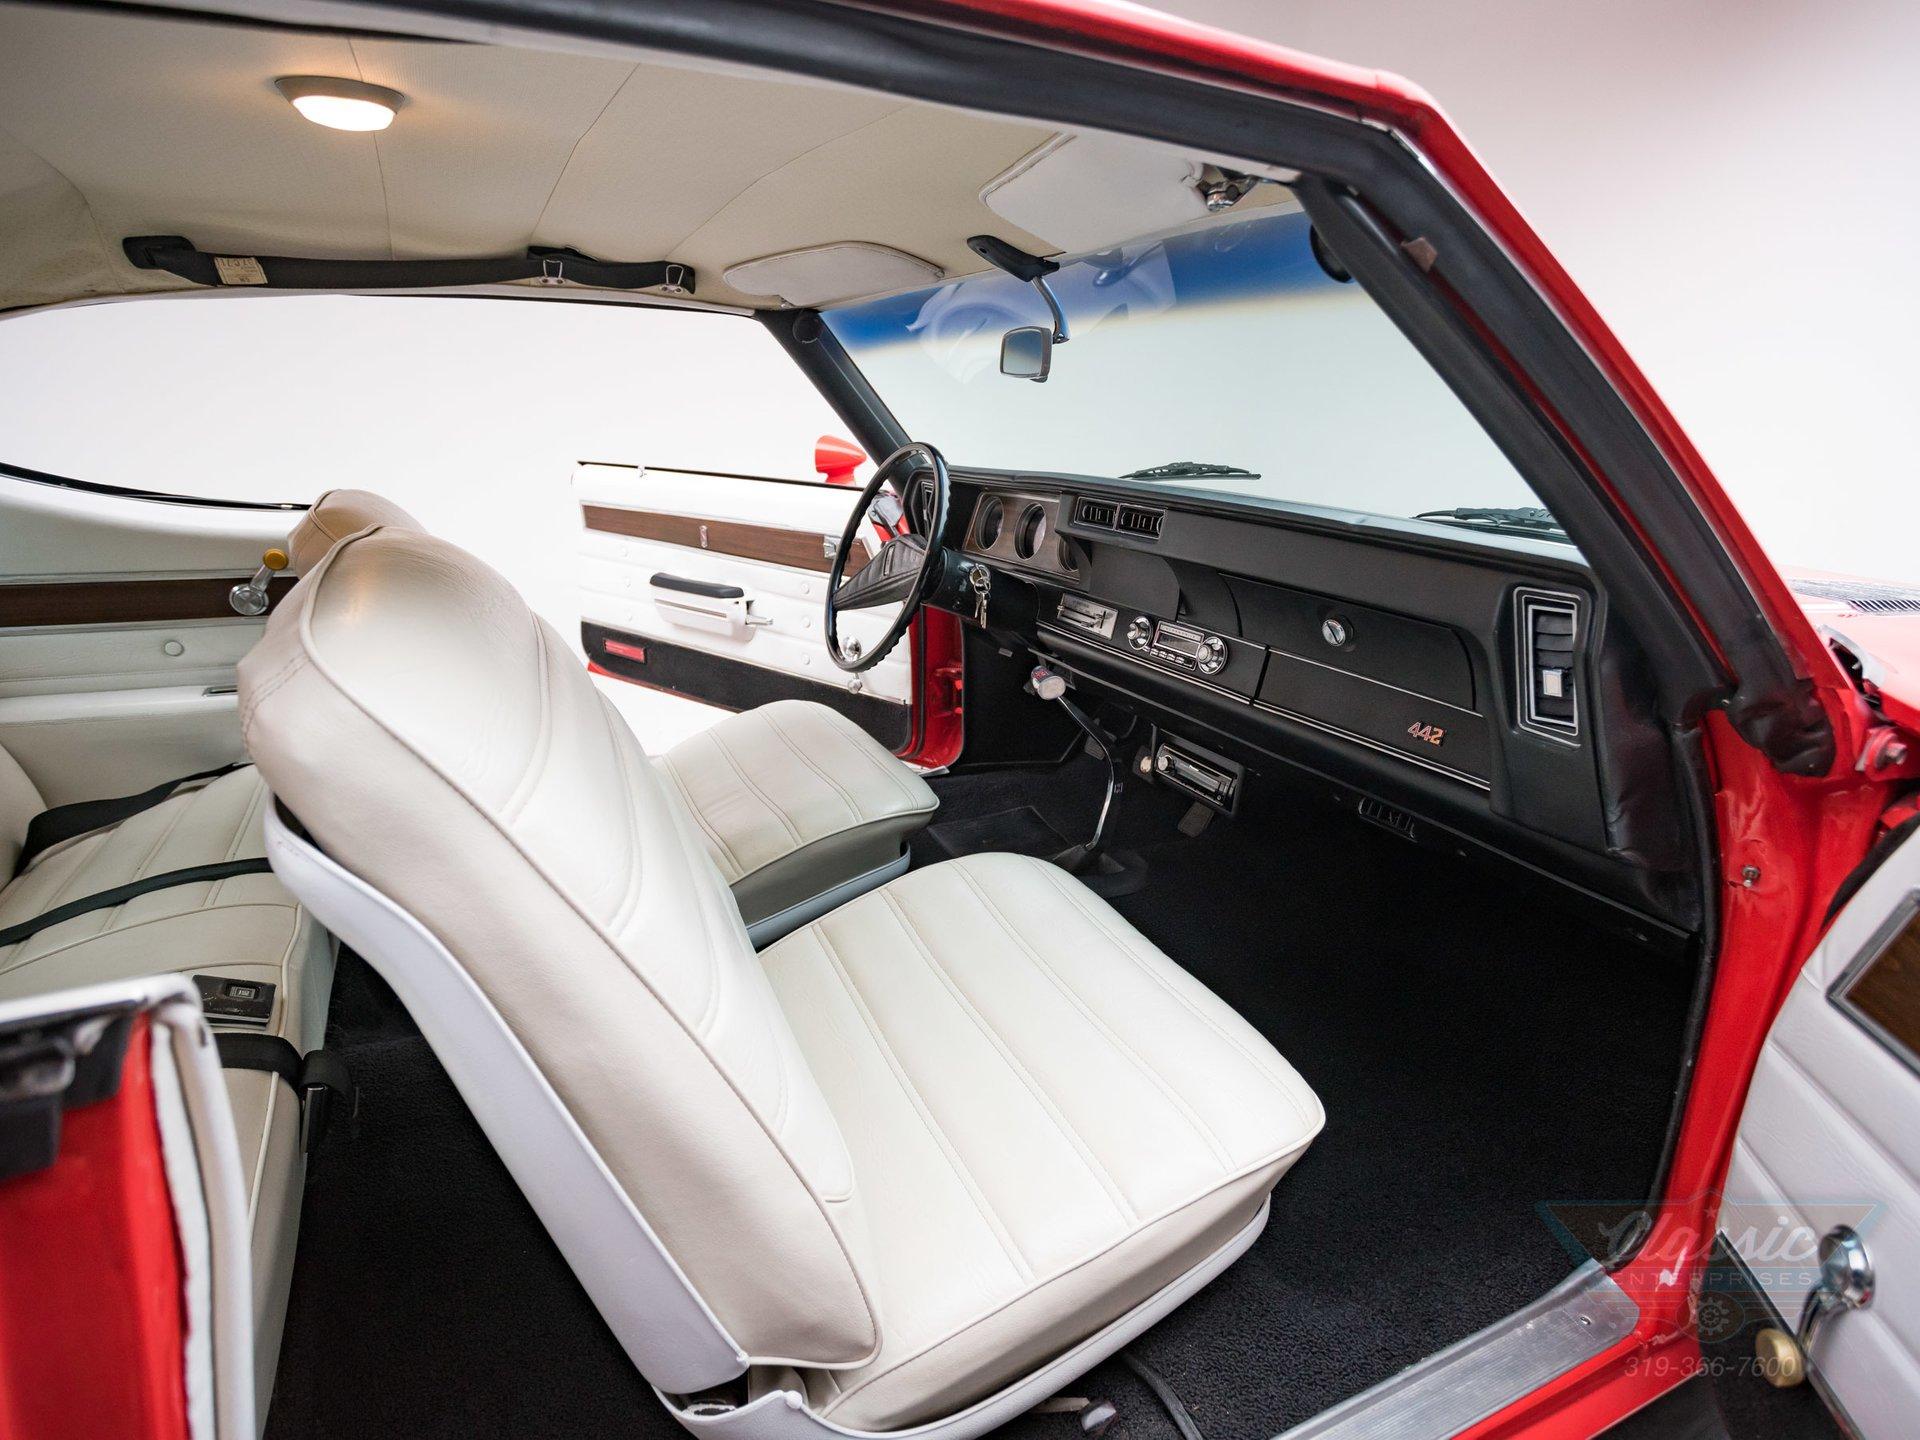 1972 Oldsmobile Cutlass for sale #30986 | MCG